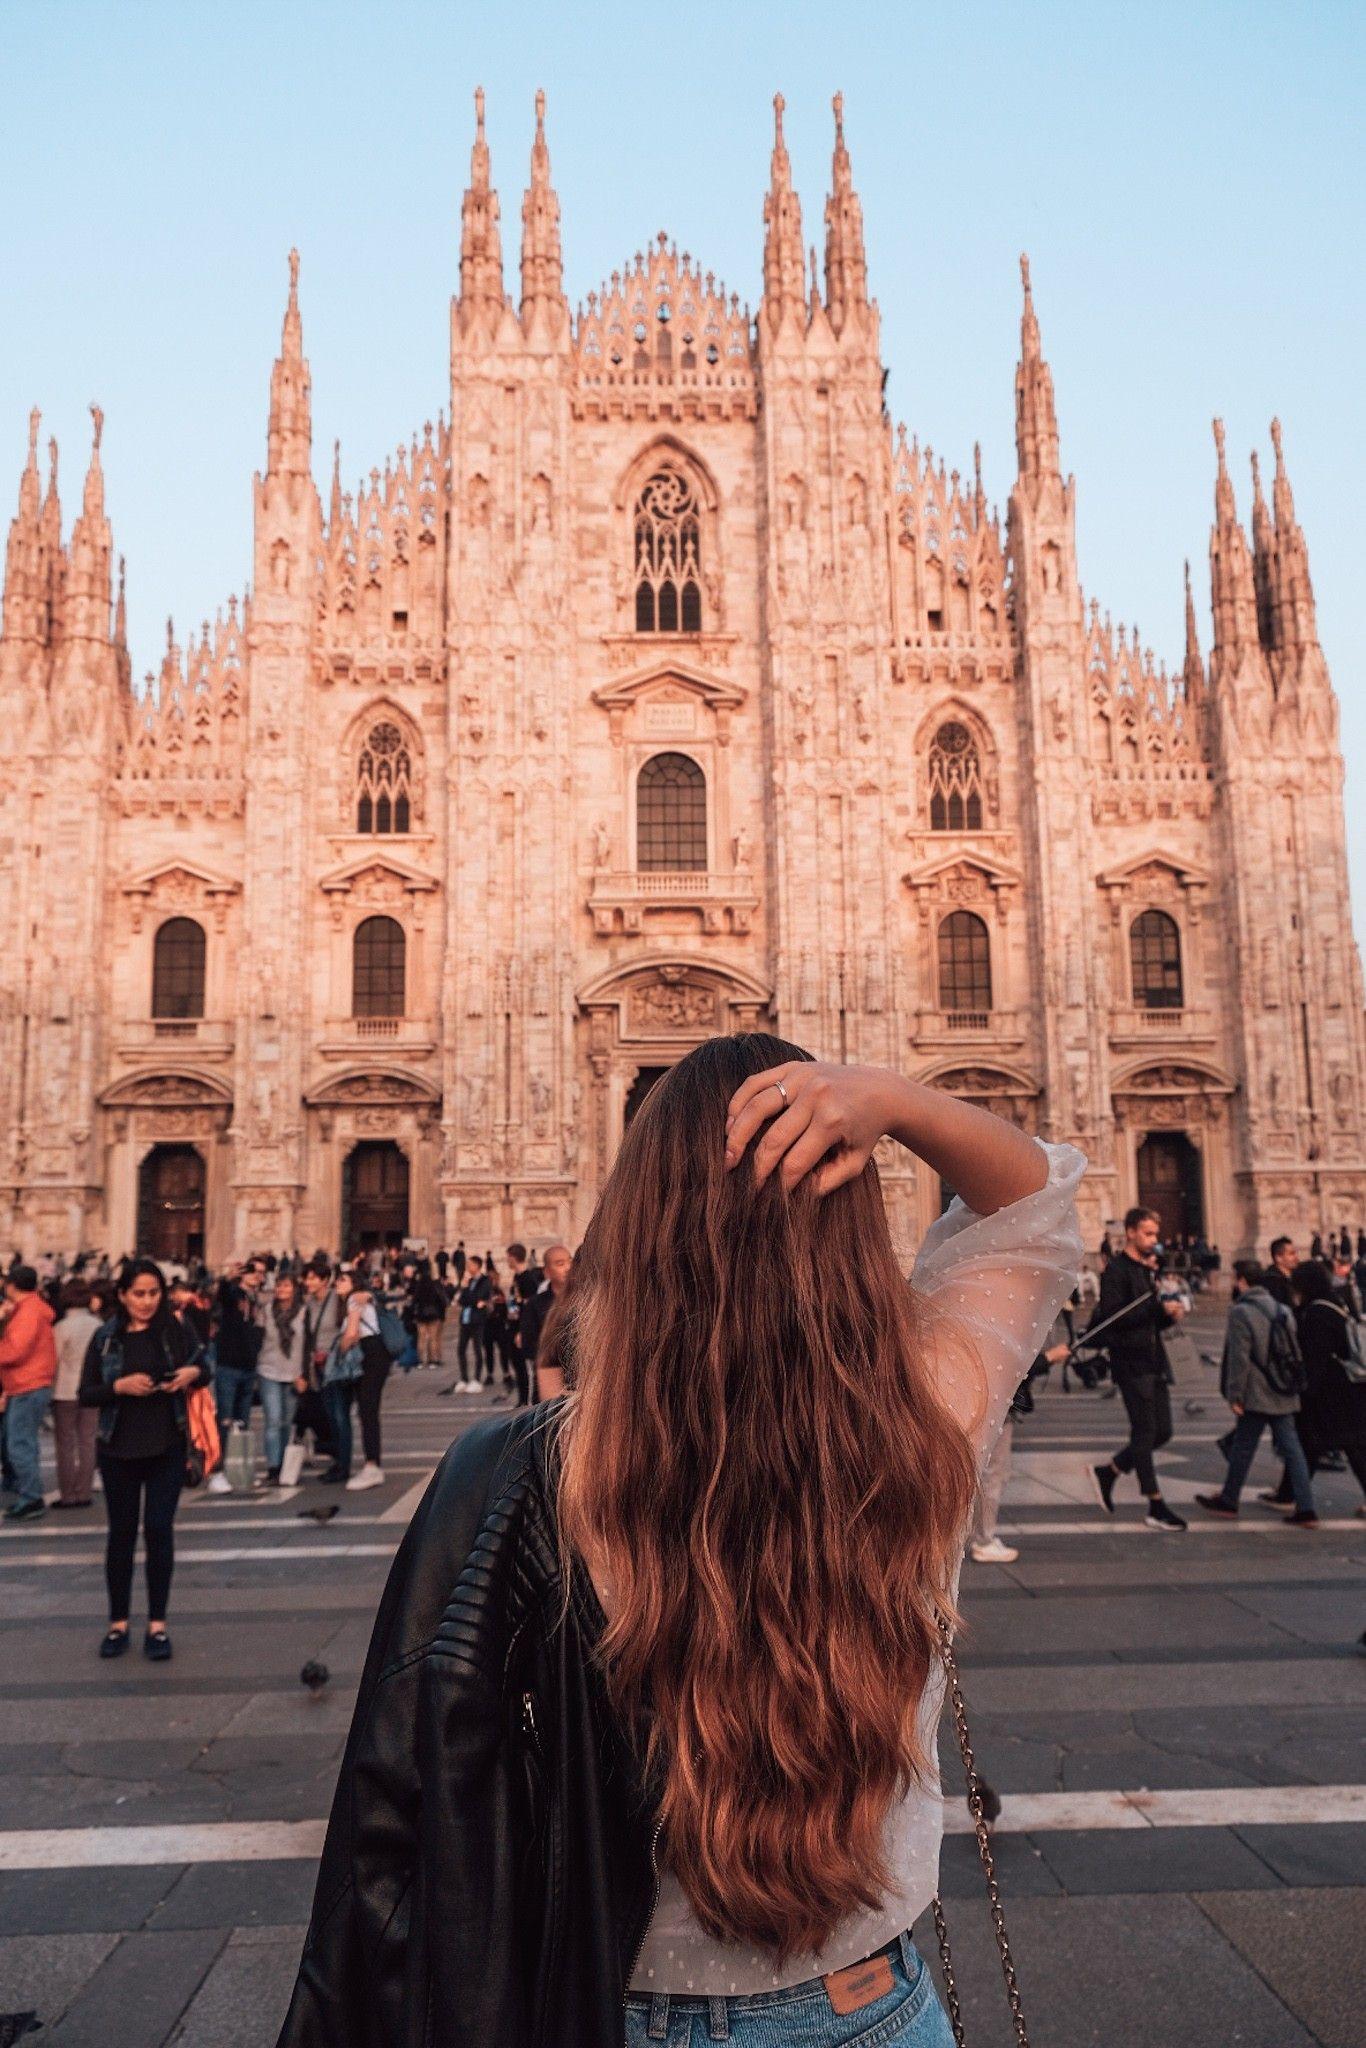 Vanessa Dias on Instagram : @ vanessadiasss Italy, Milano Duomo #milano #duomomilano #milan #milanphotos #milanophotography